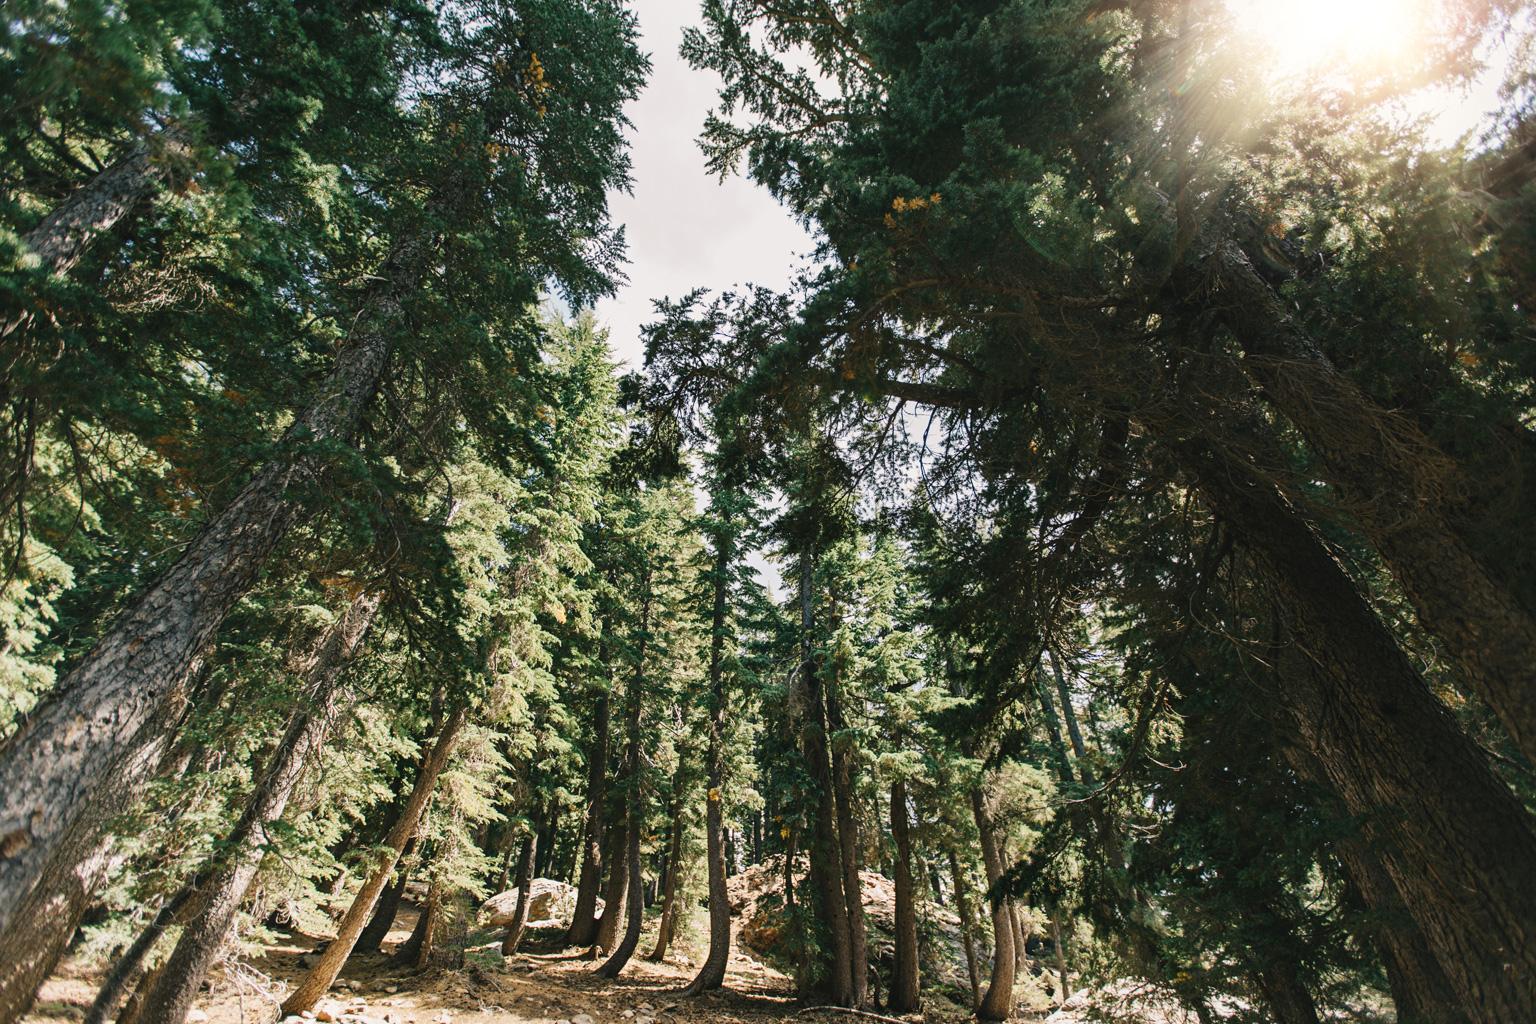 CindyGiovagnoli_outdoors_photographer_Sierra_Buttes_firetower_watchtower_Sardine_Snag_Bear_lake_hike_swim_camp-010.jpg